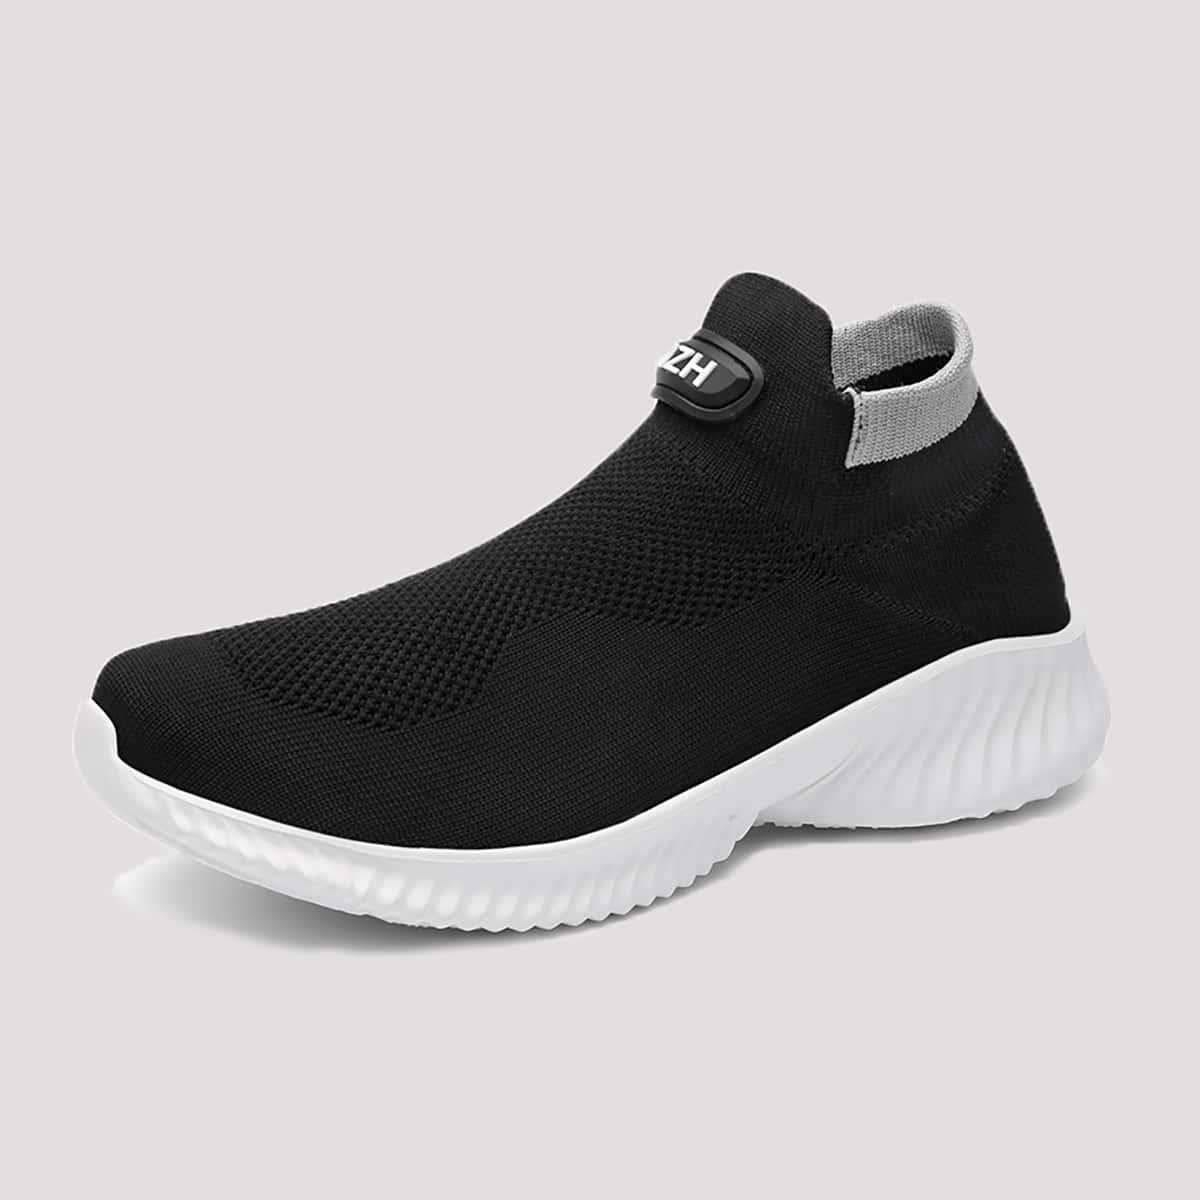 Буква мужские кроссовки